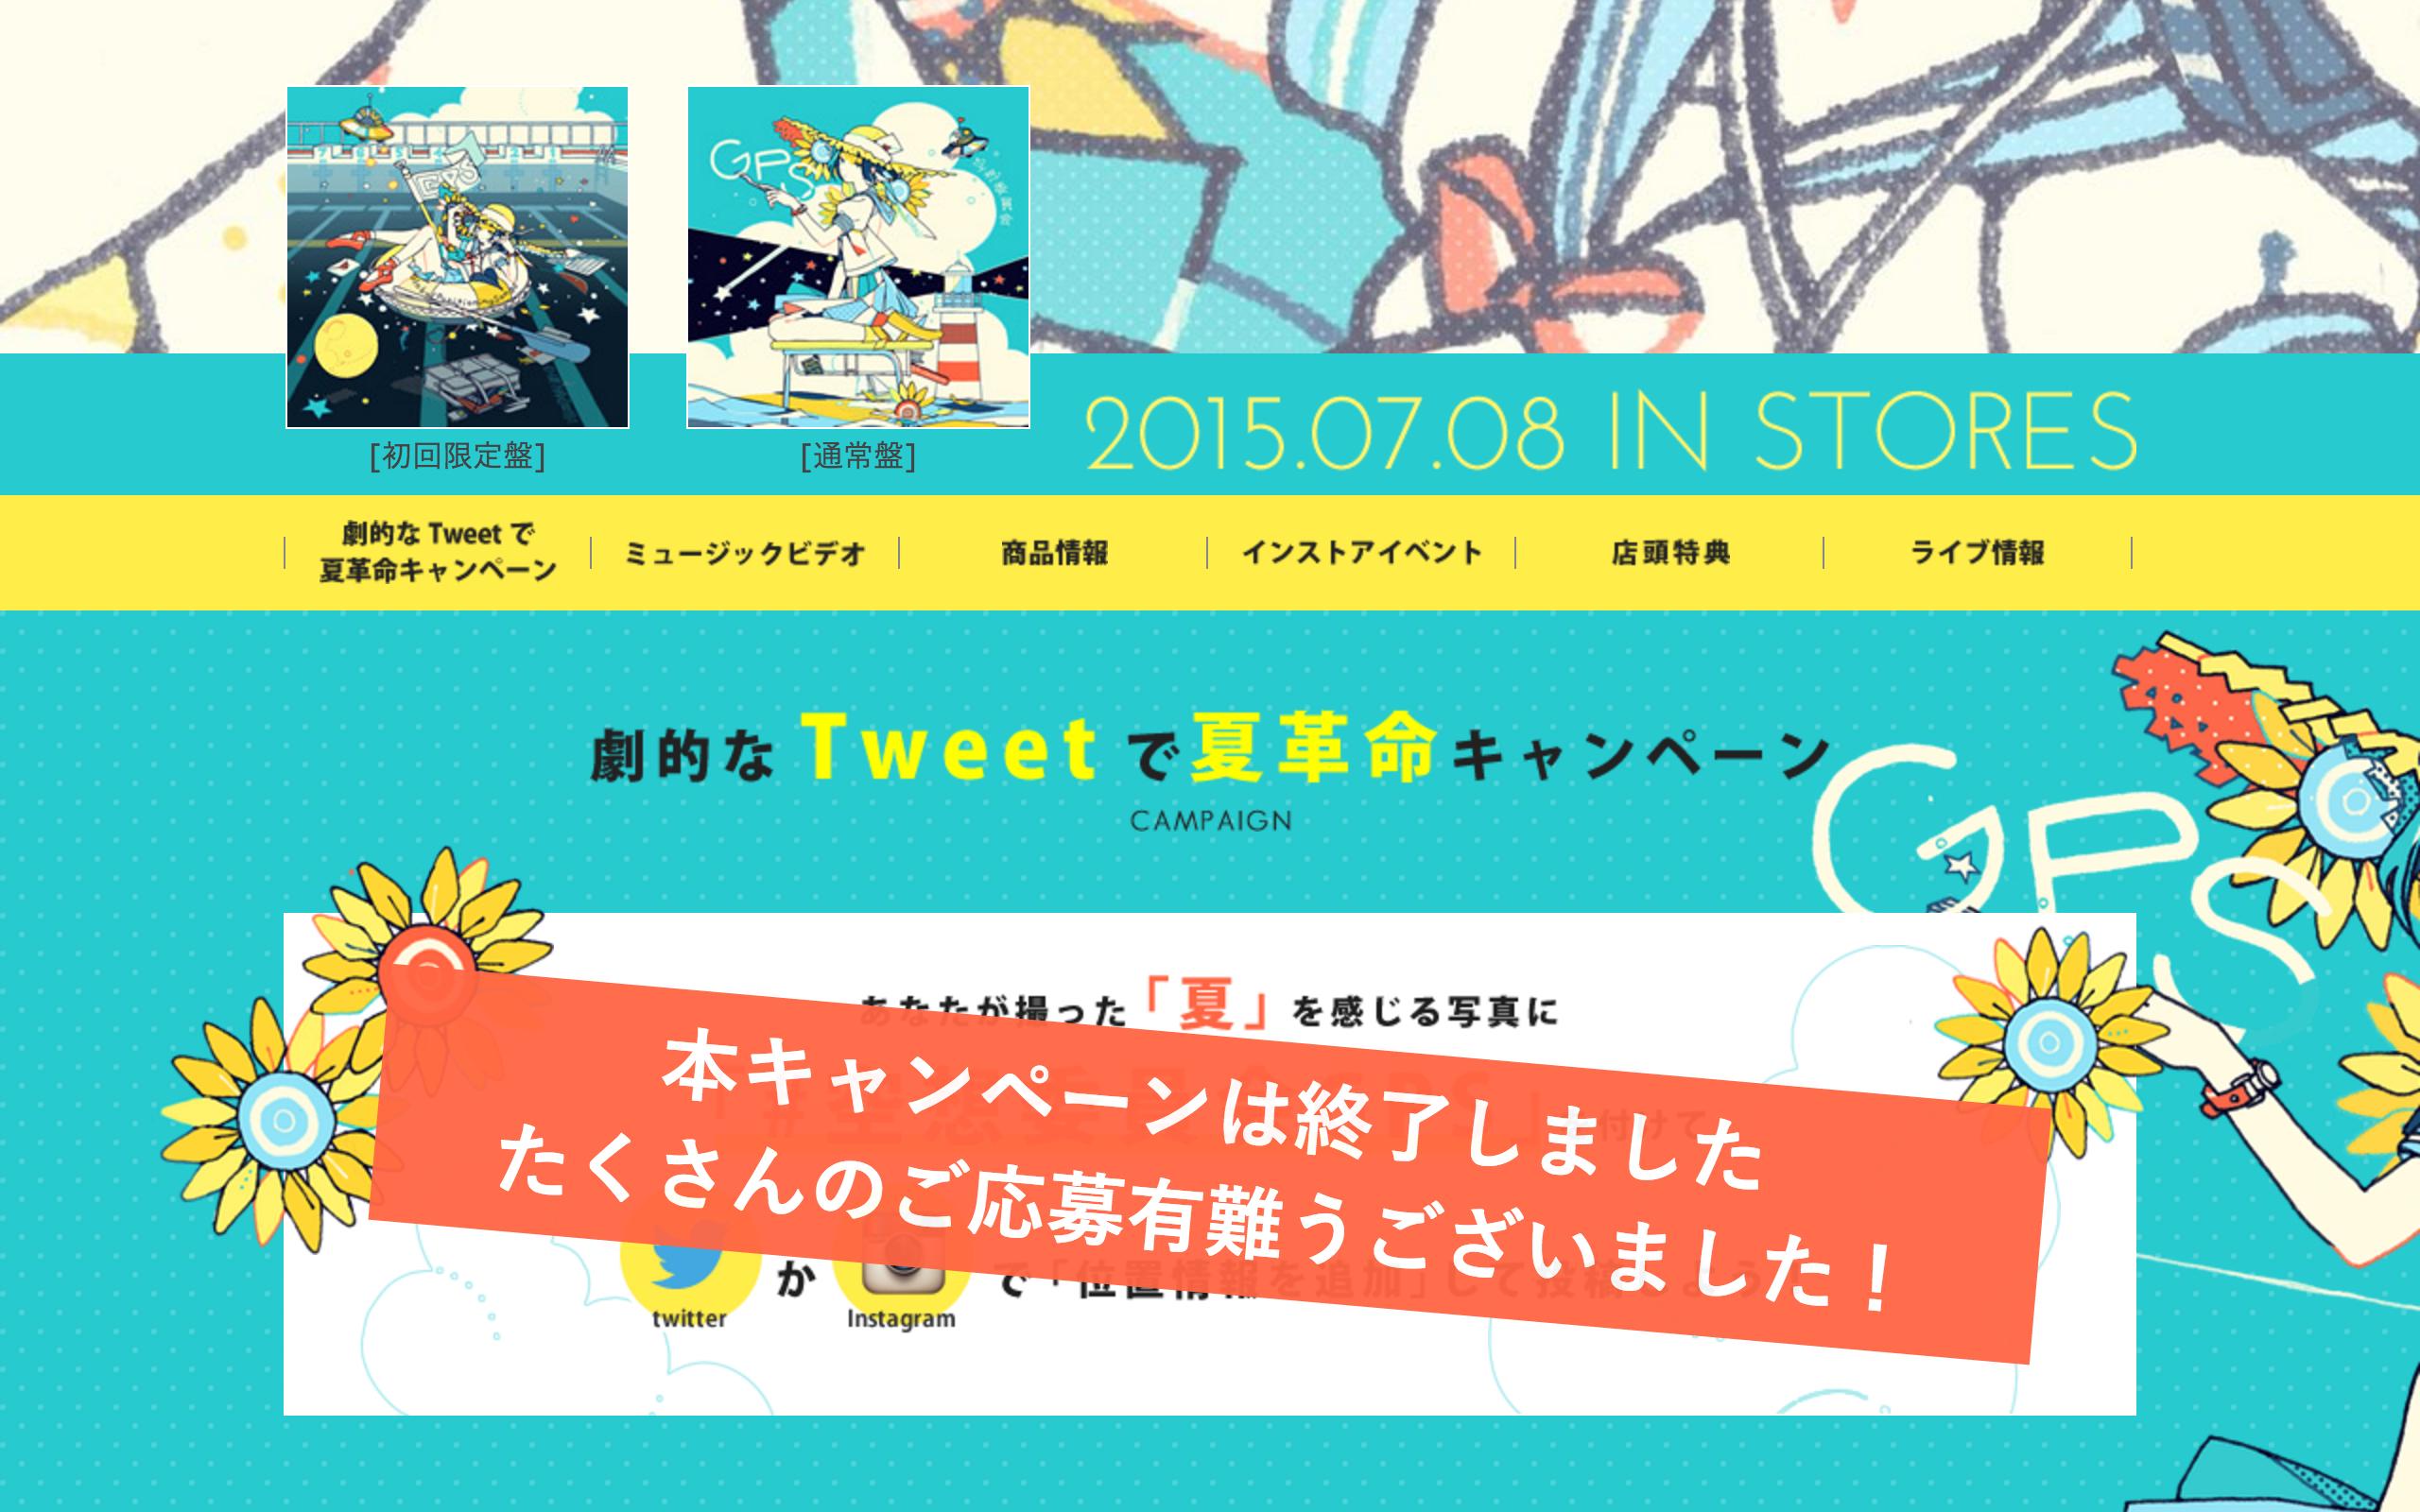 Dramatic tweets revolution summer campaign - Kuusou Iinkai